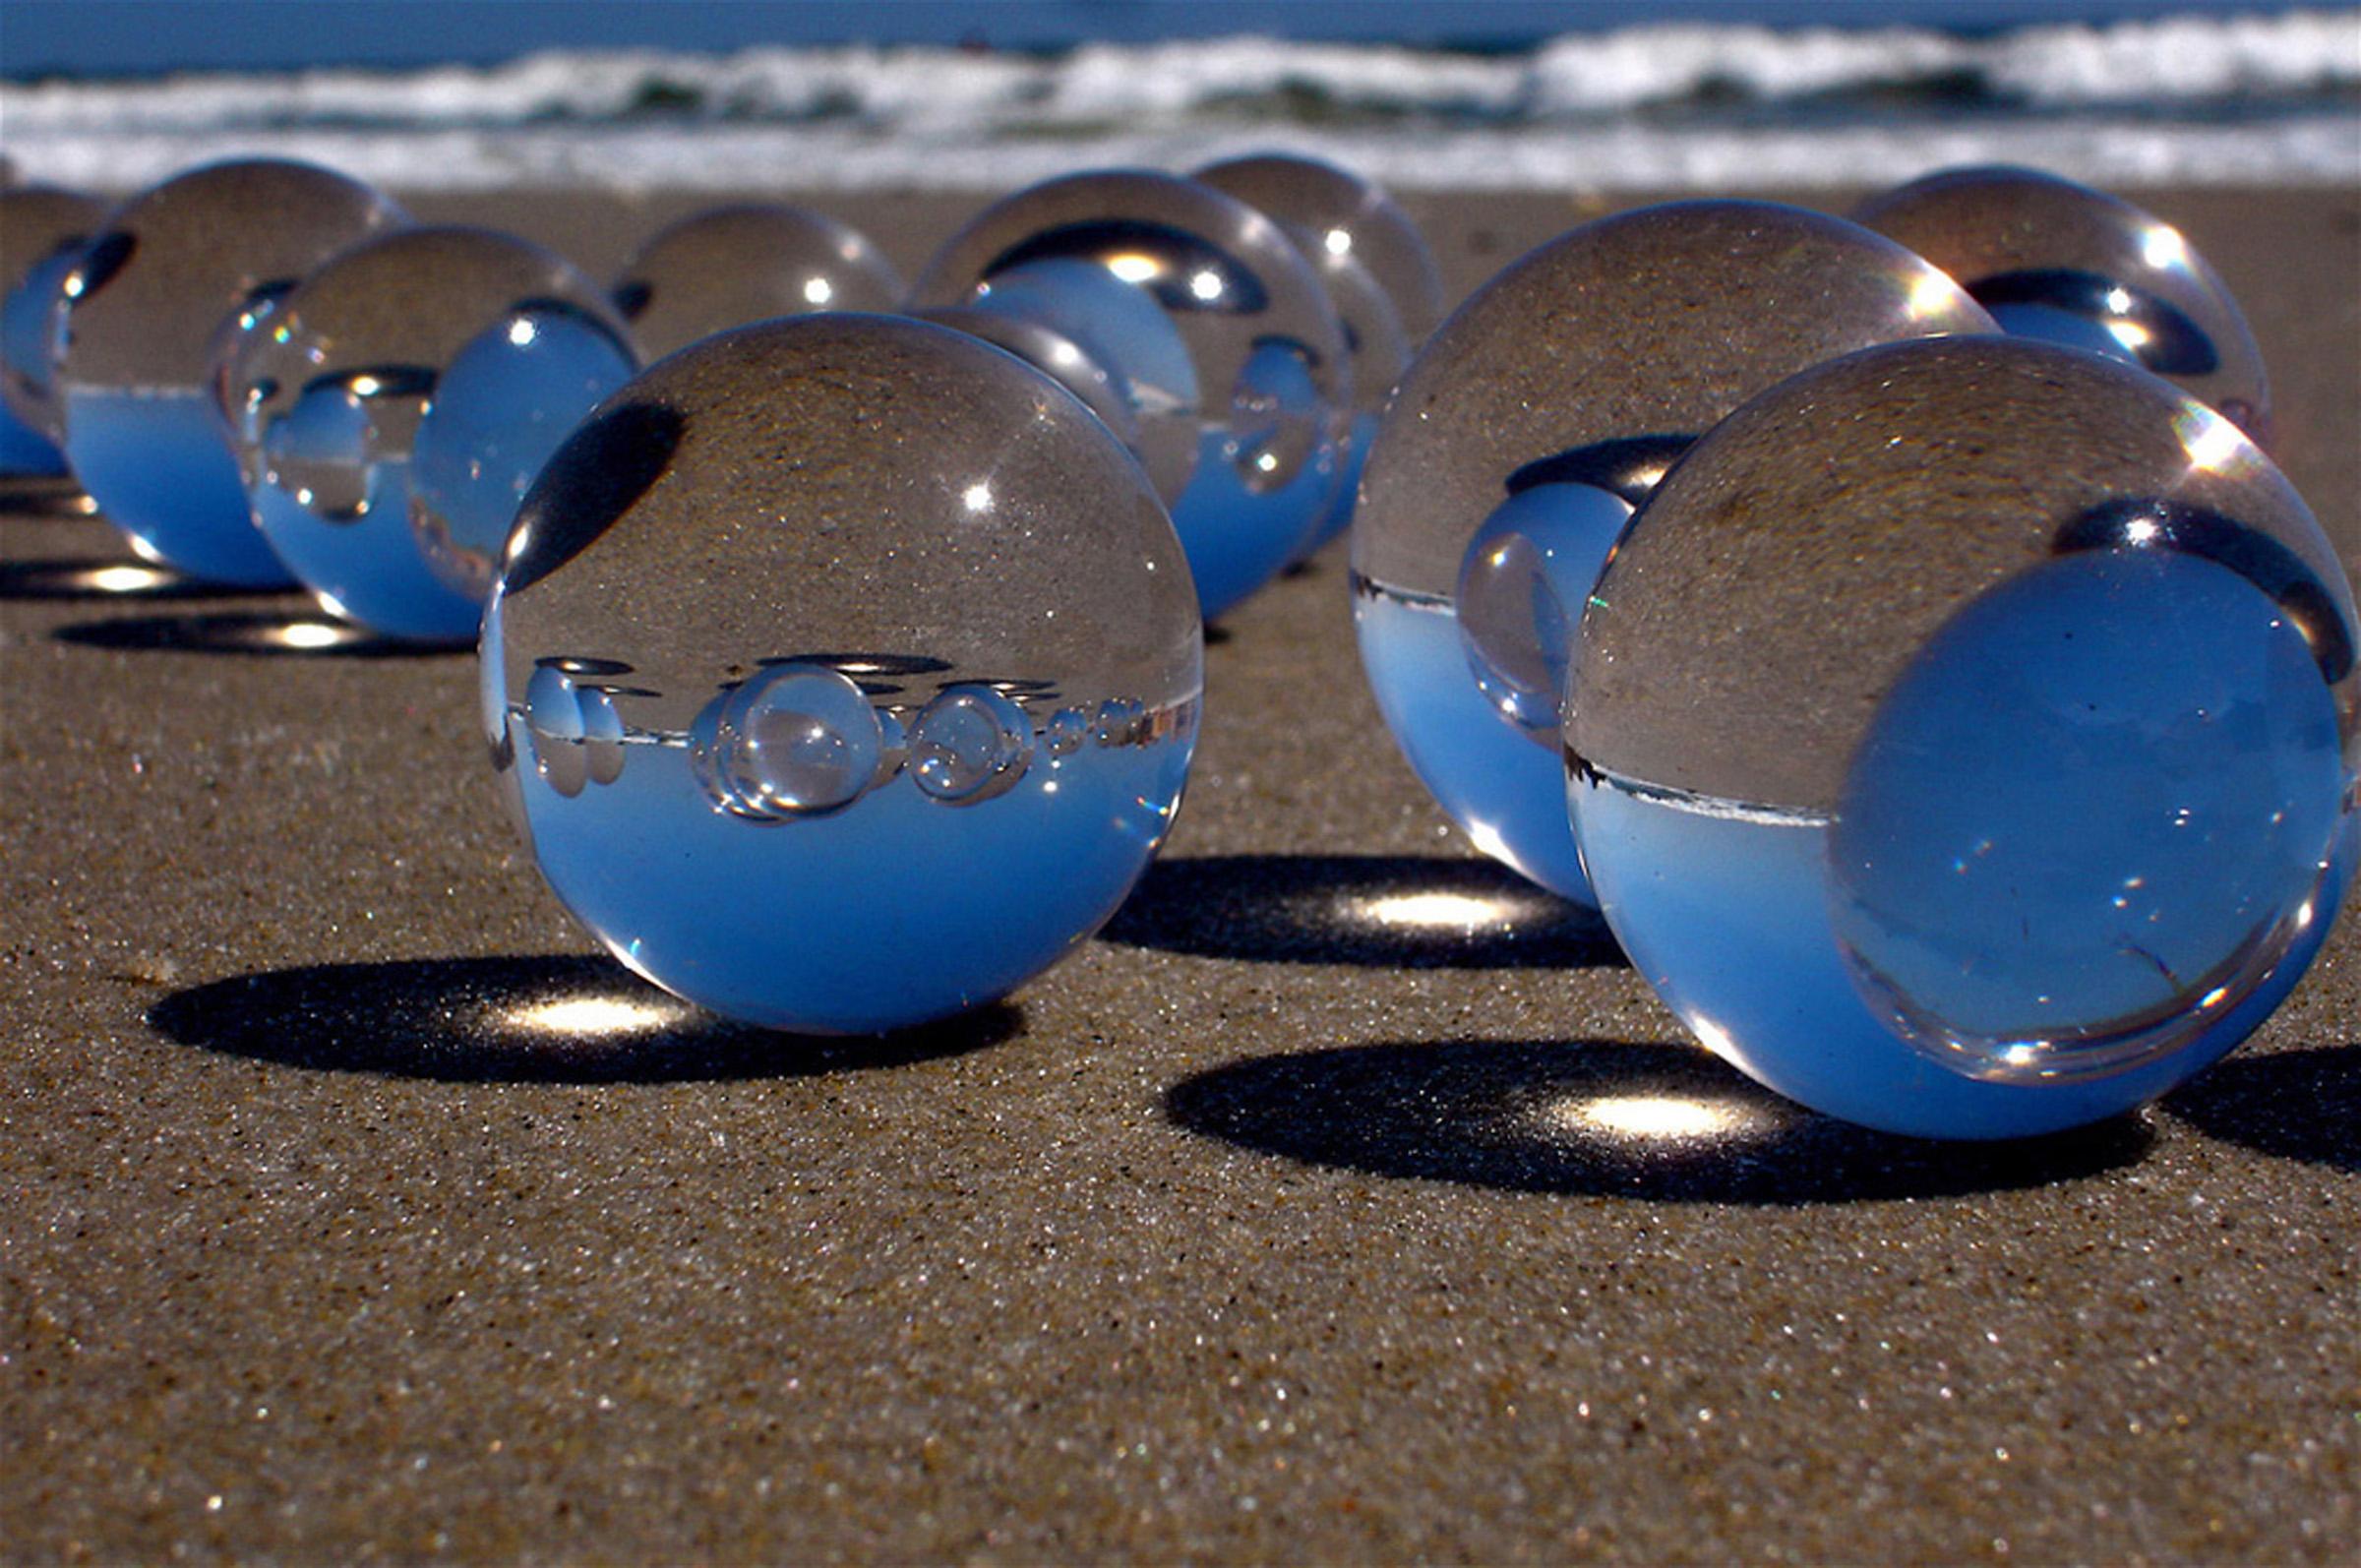 Memoria del Mar I (2010) - Lucia Warck-Meister